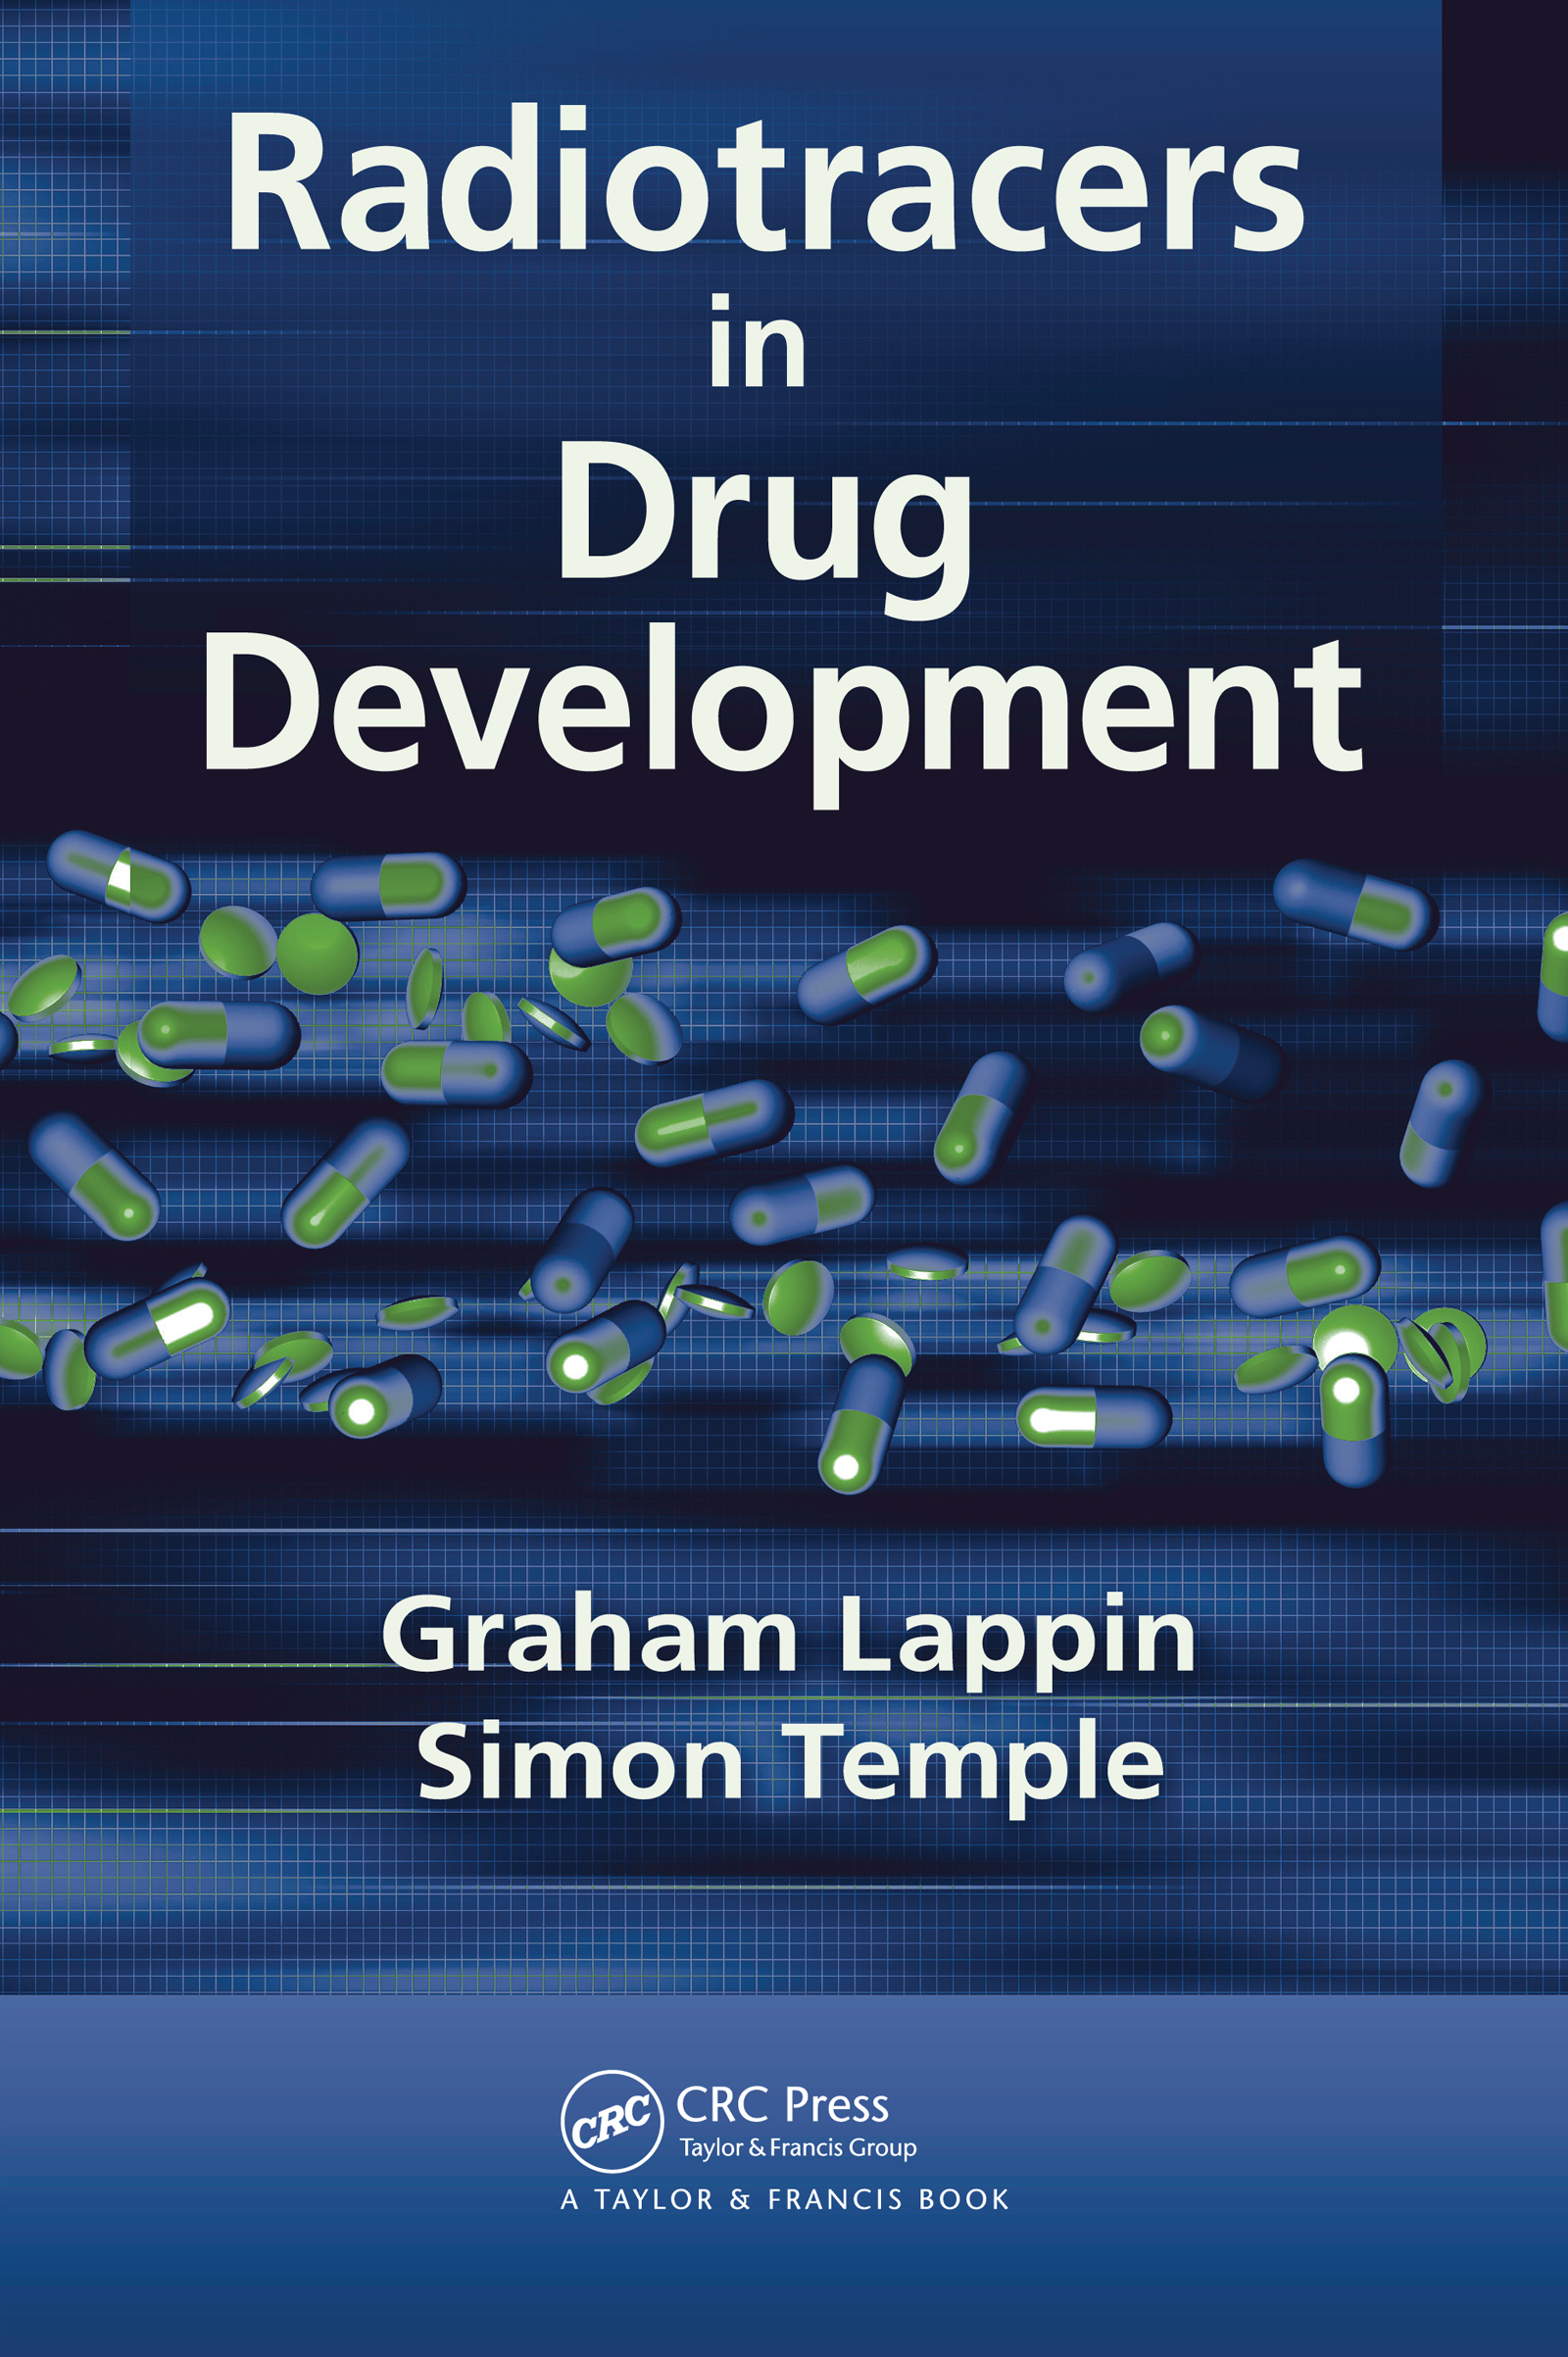 Radiotracers in Drug Development